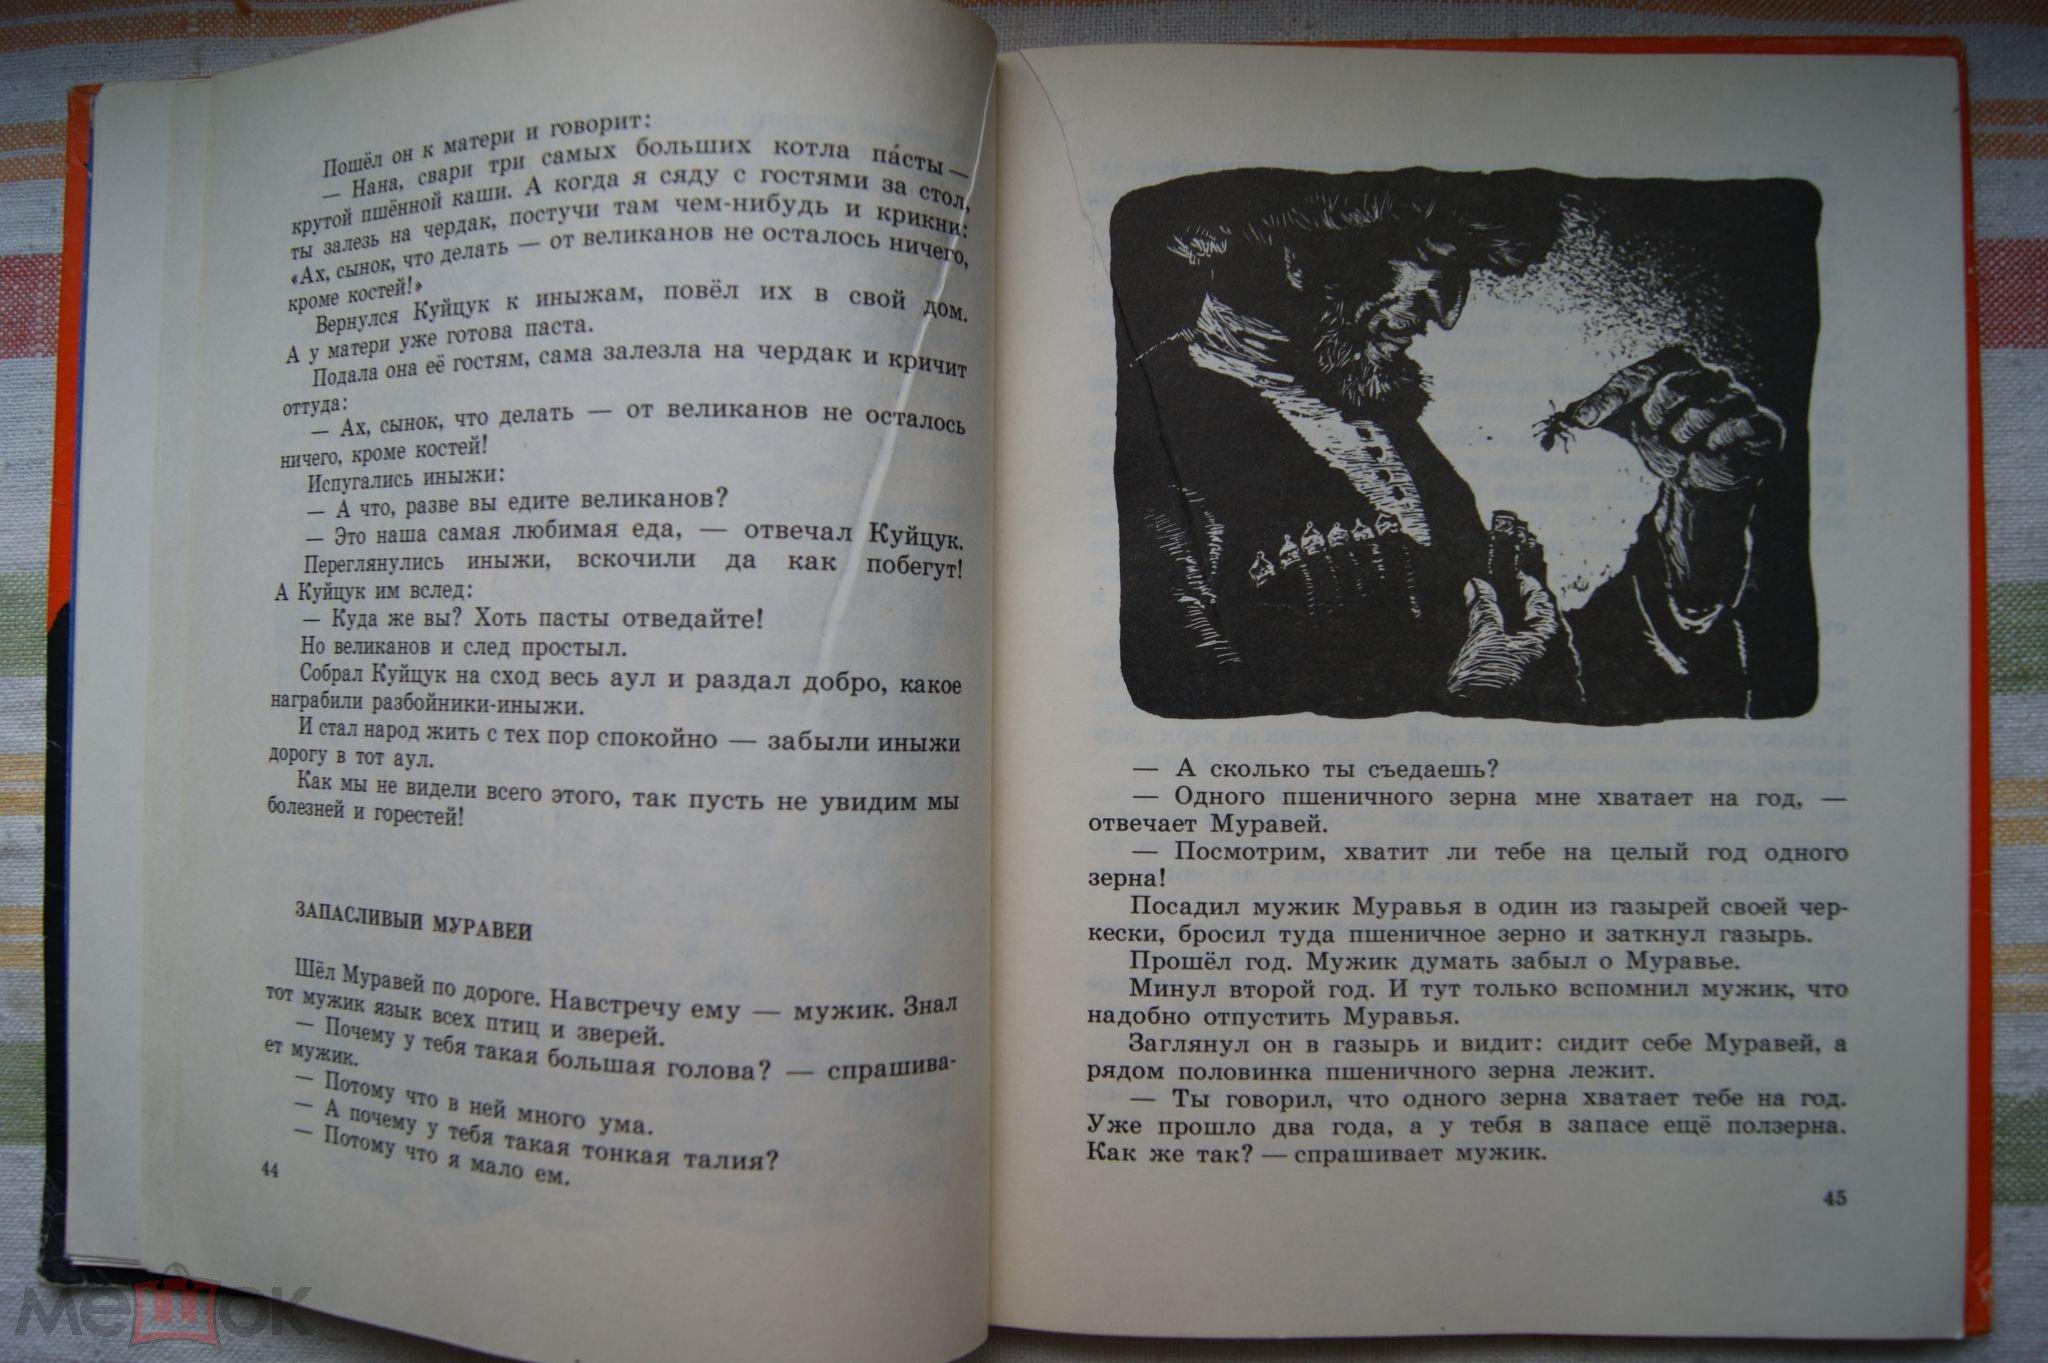 Кабардинские сказки на кабардинском языке